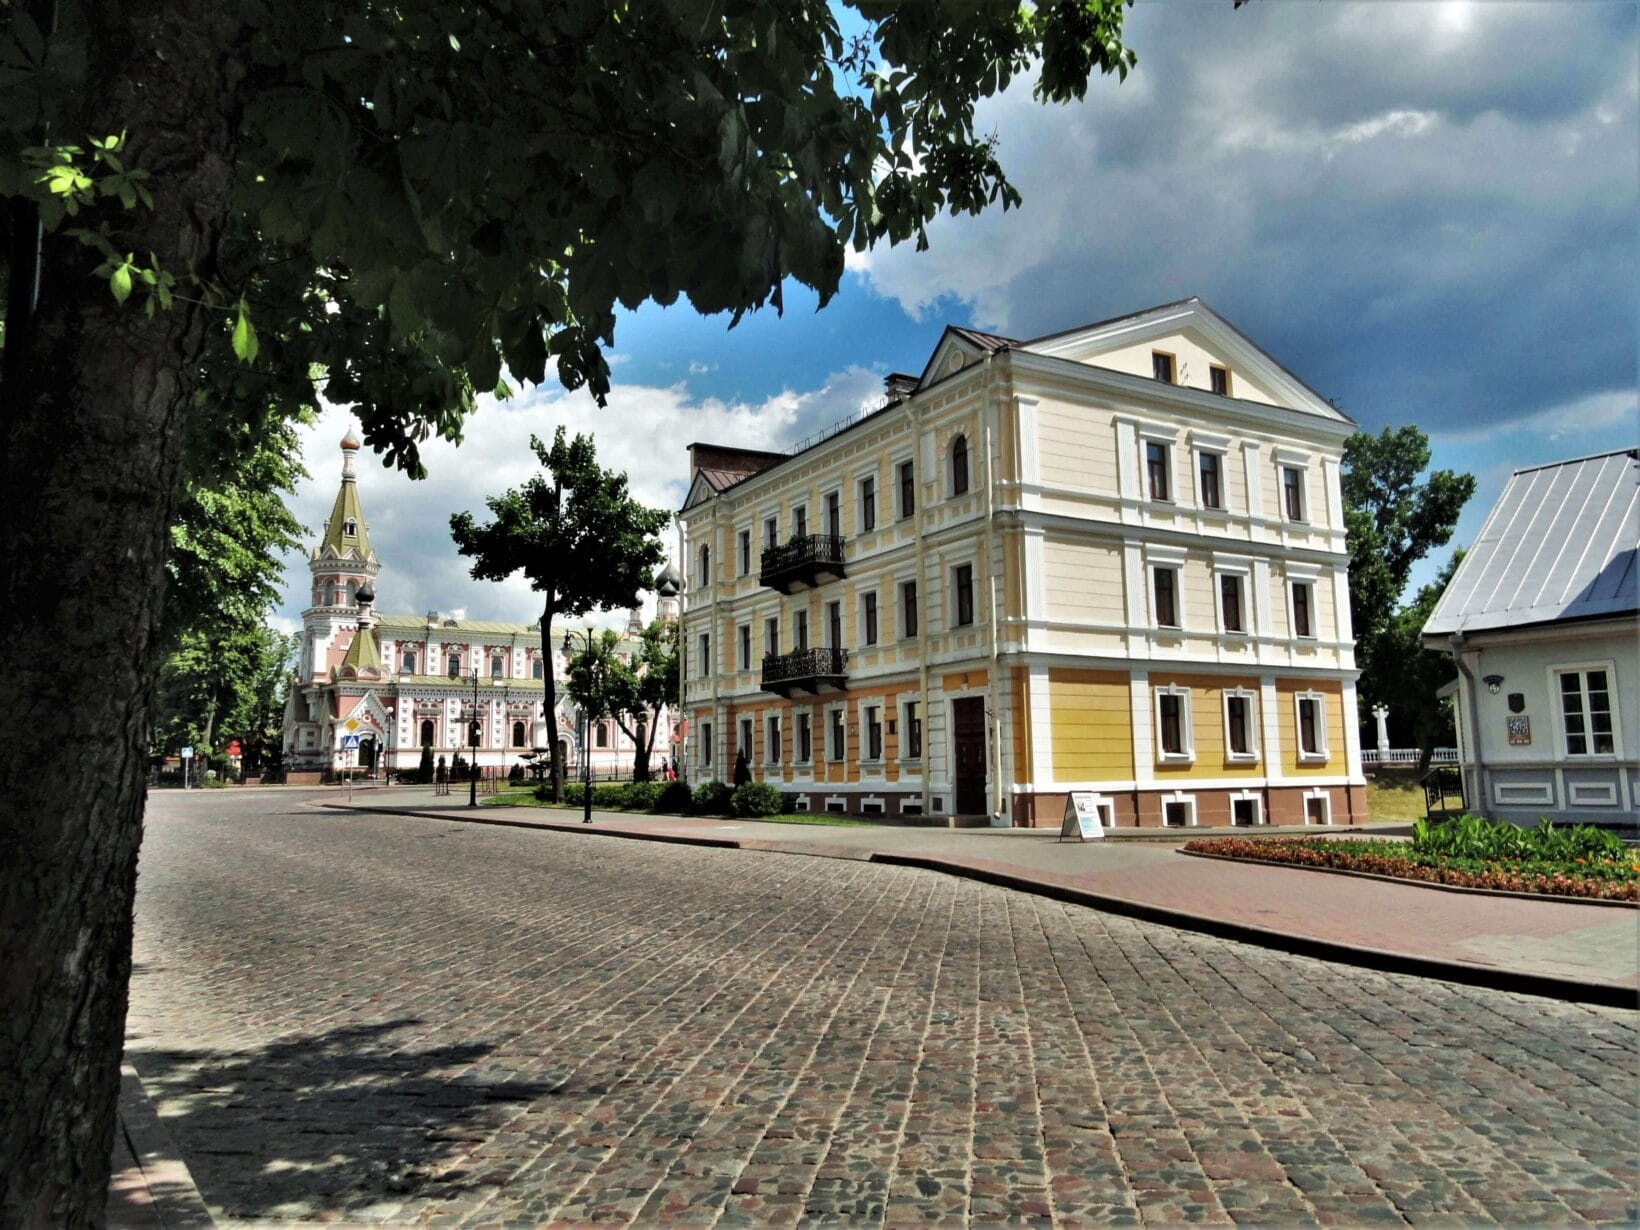 houses in Grodno